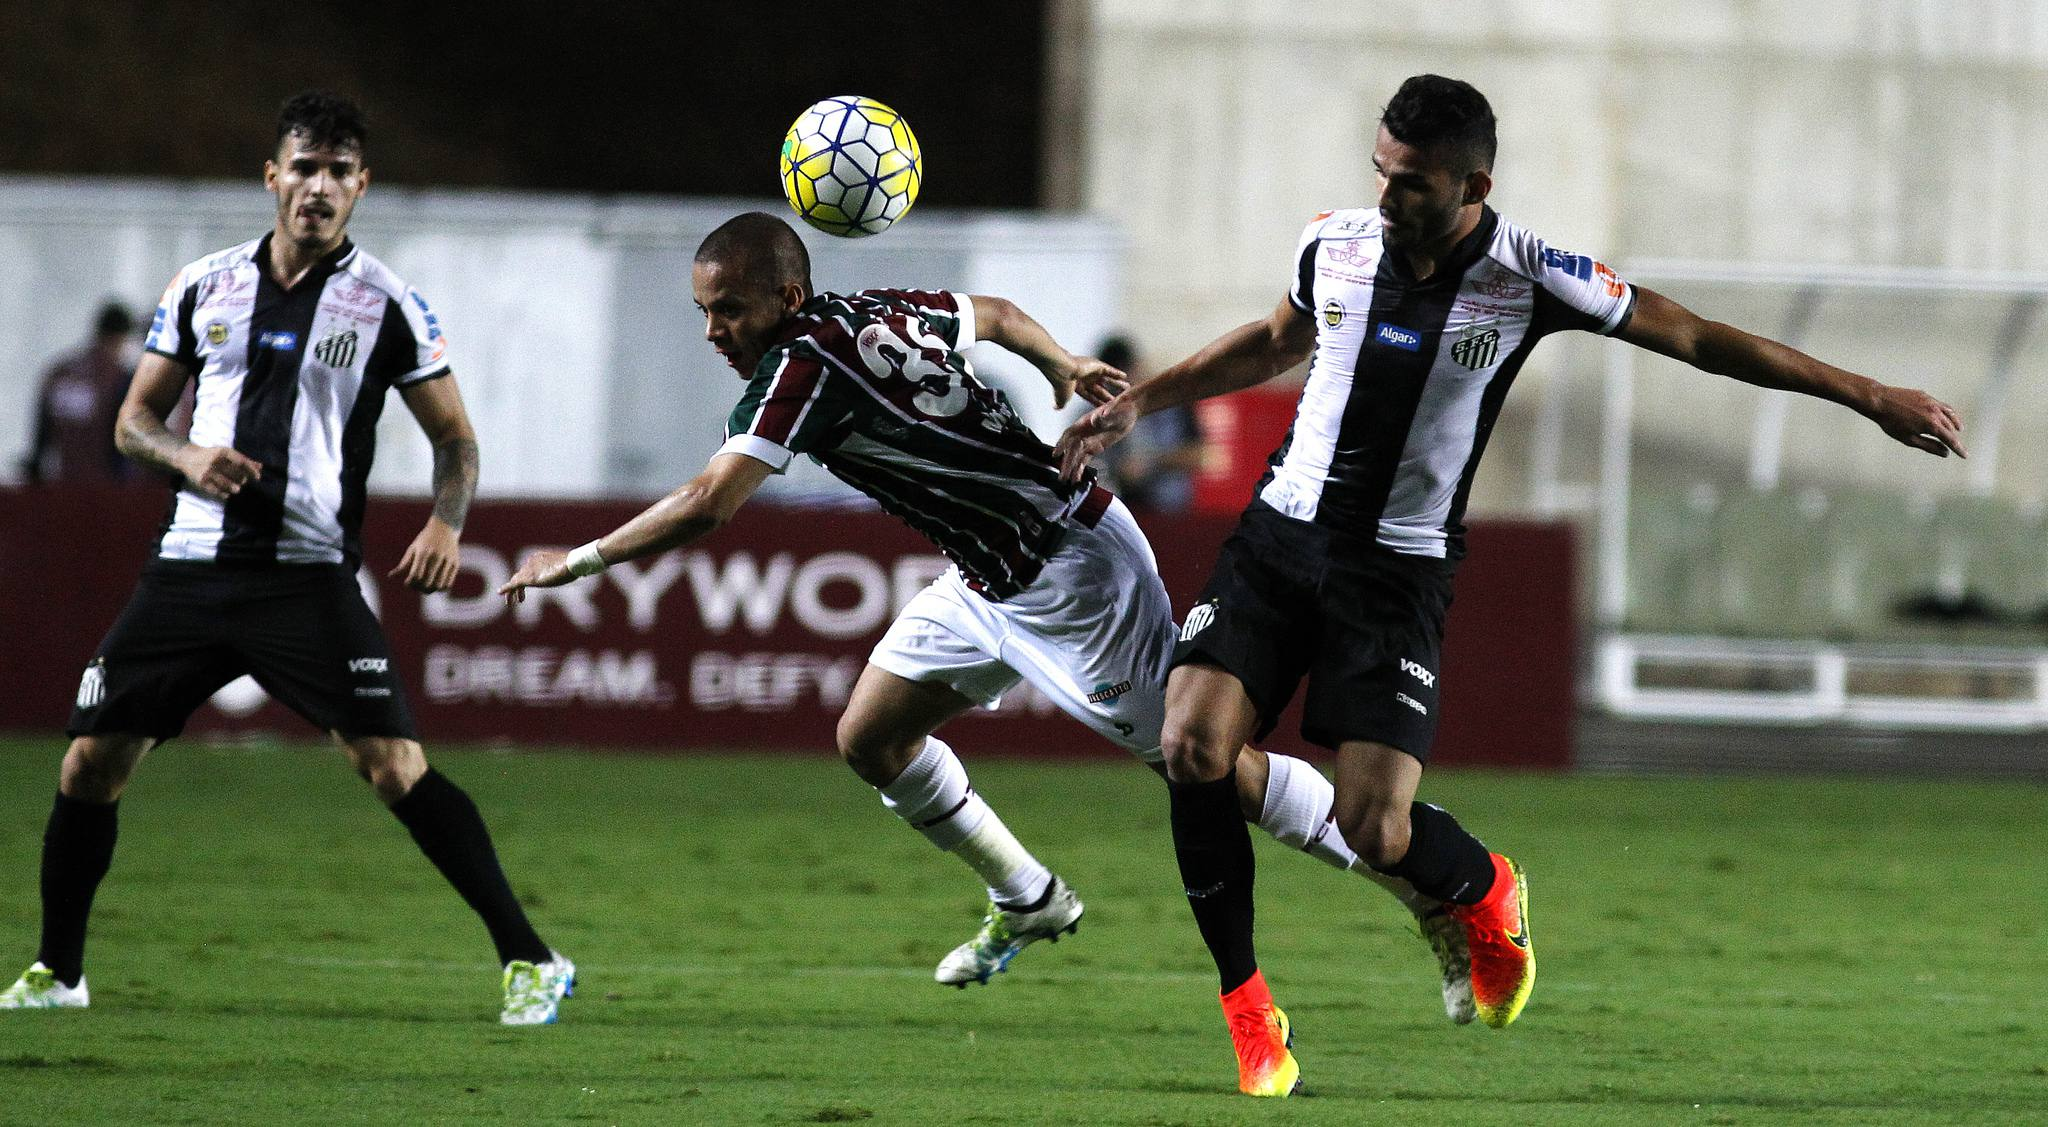 Santos Fluminense Maçı İddaa Tahmini 15.8.2017